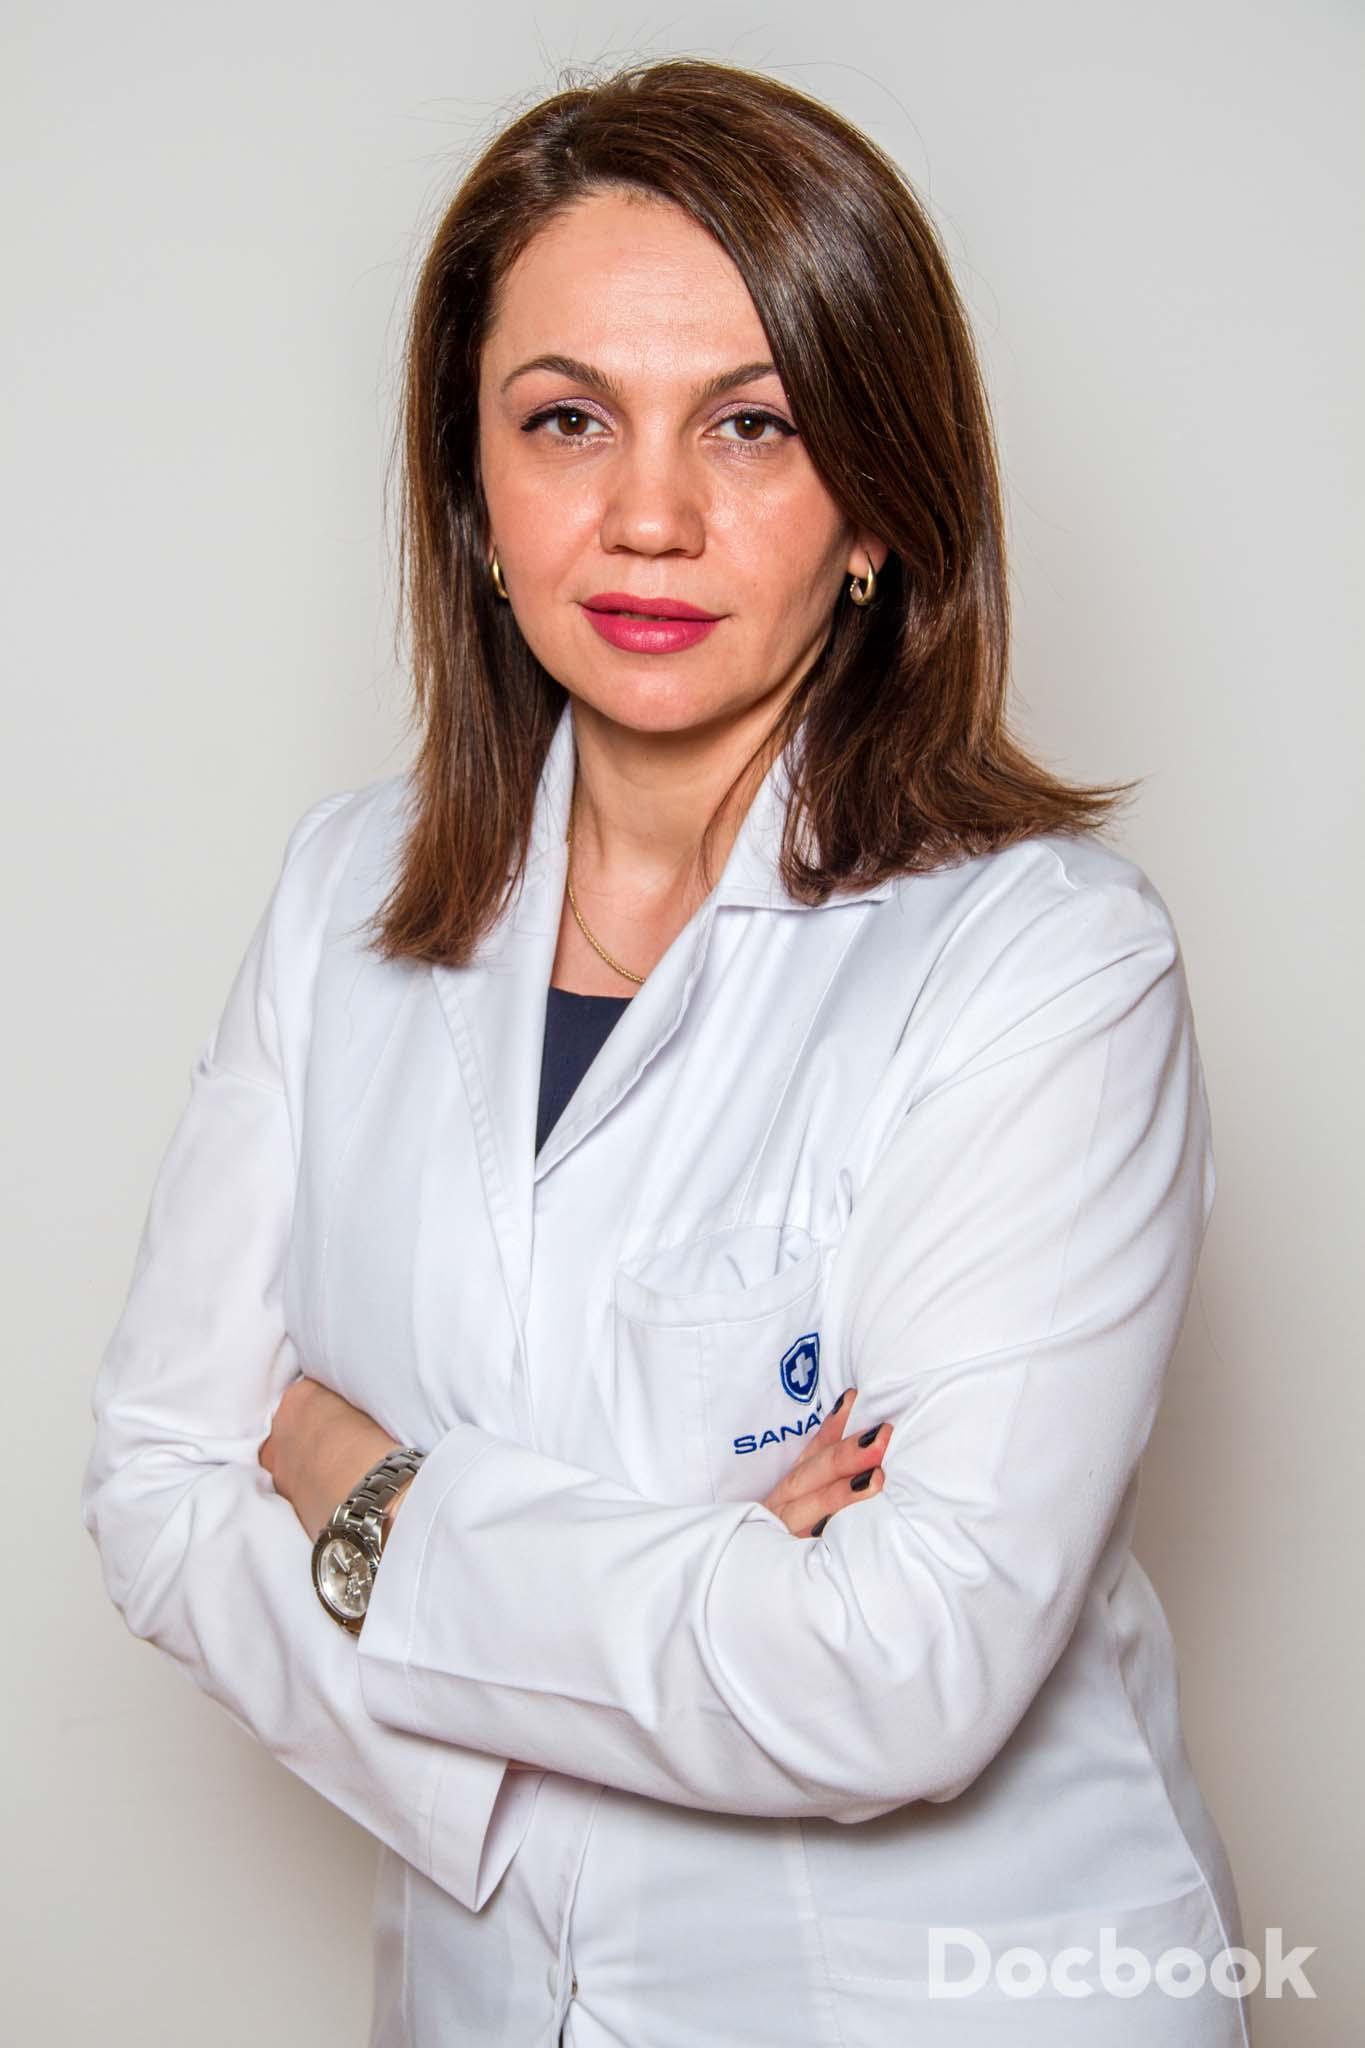 Dr. Ileana Stamate